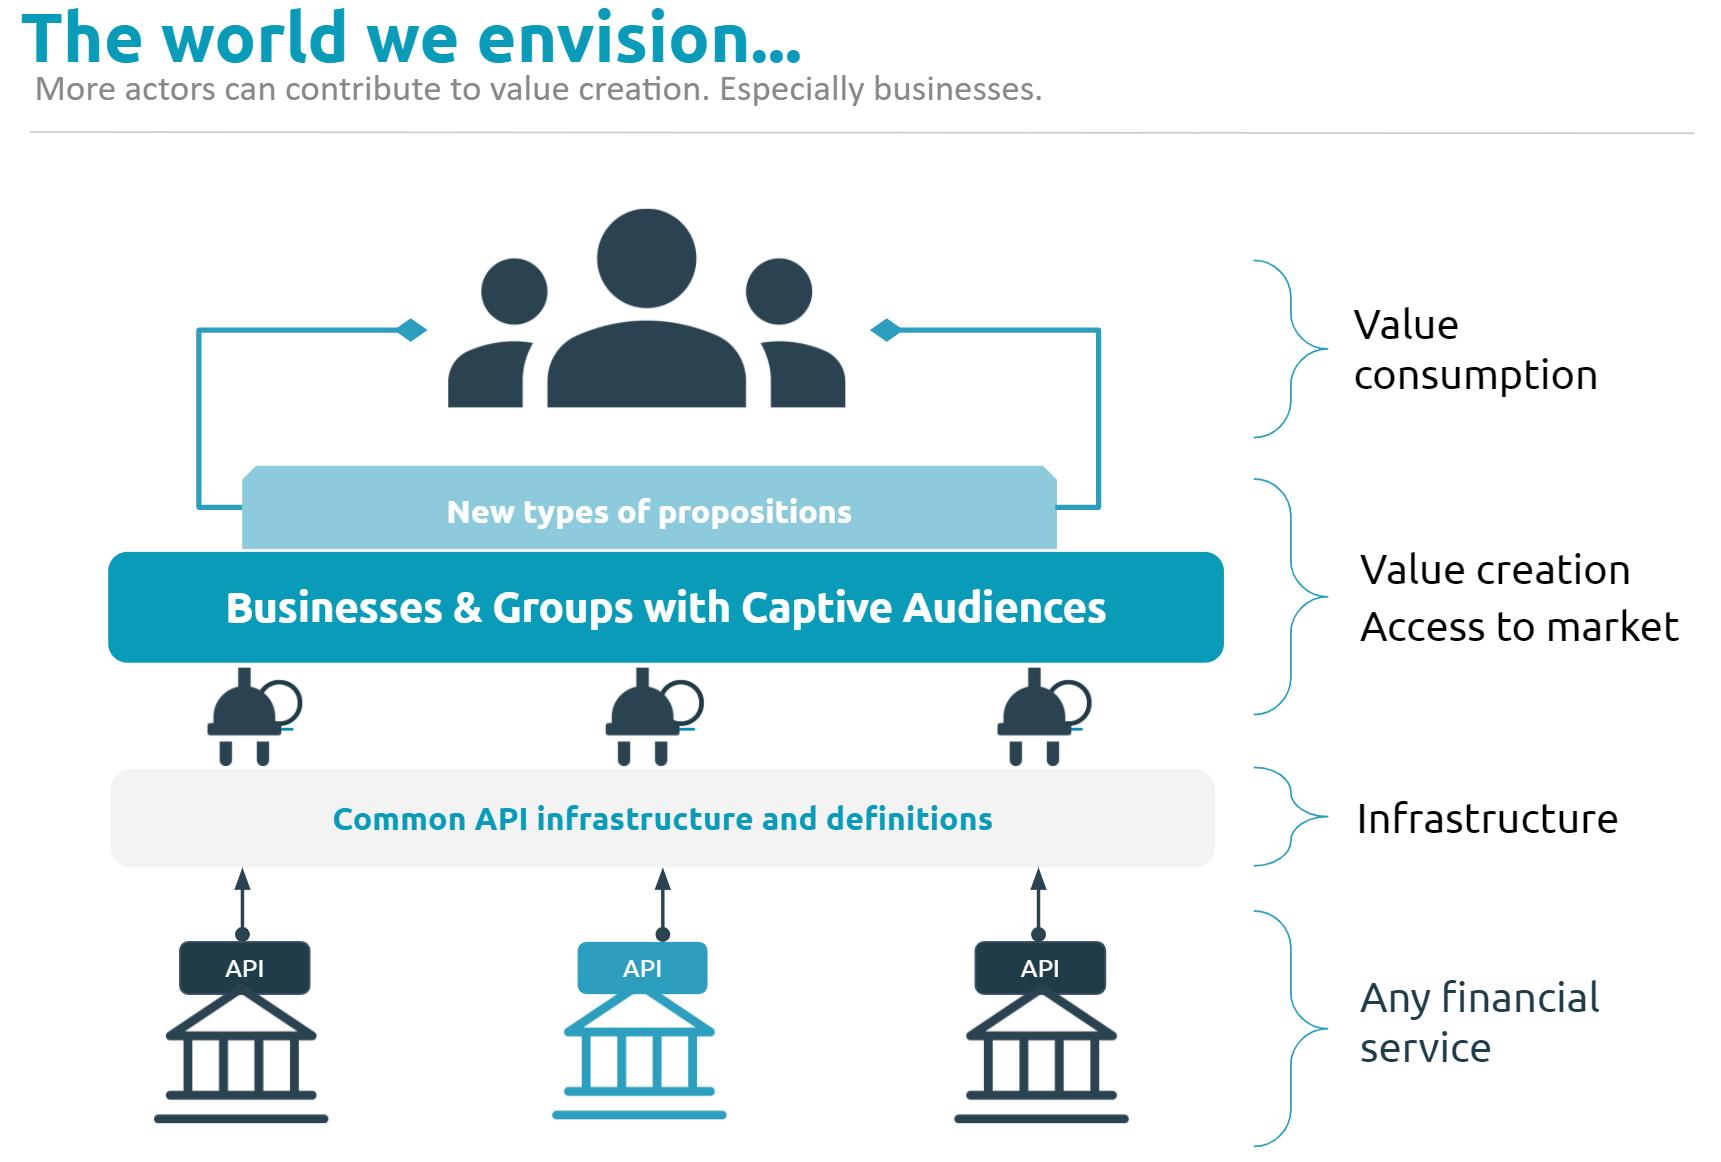 OnePipe's ecosystem